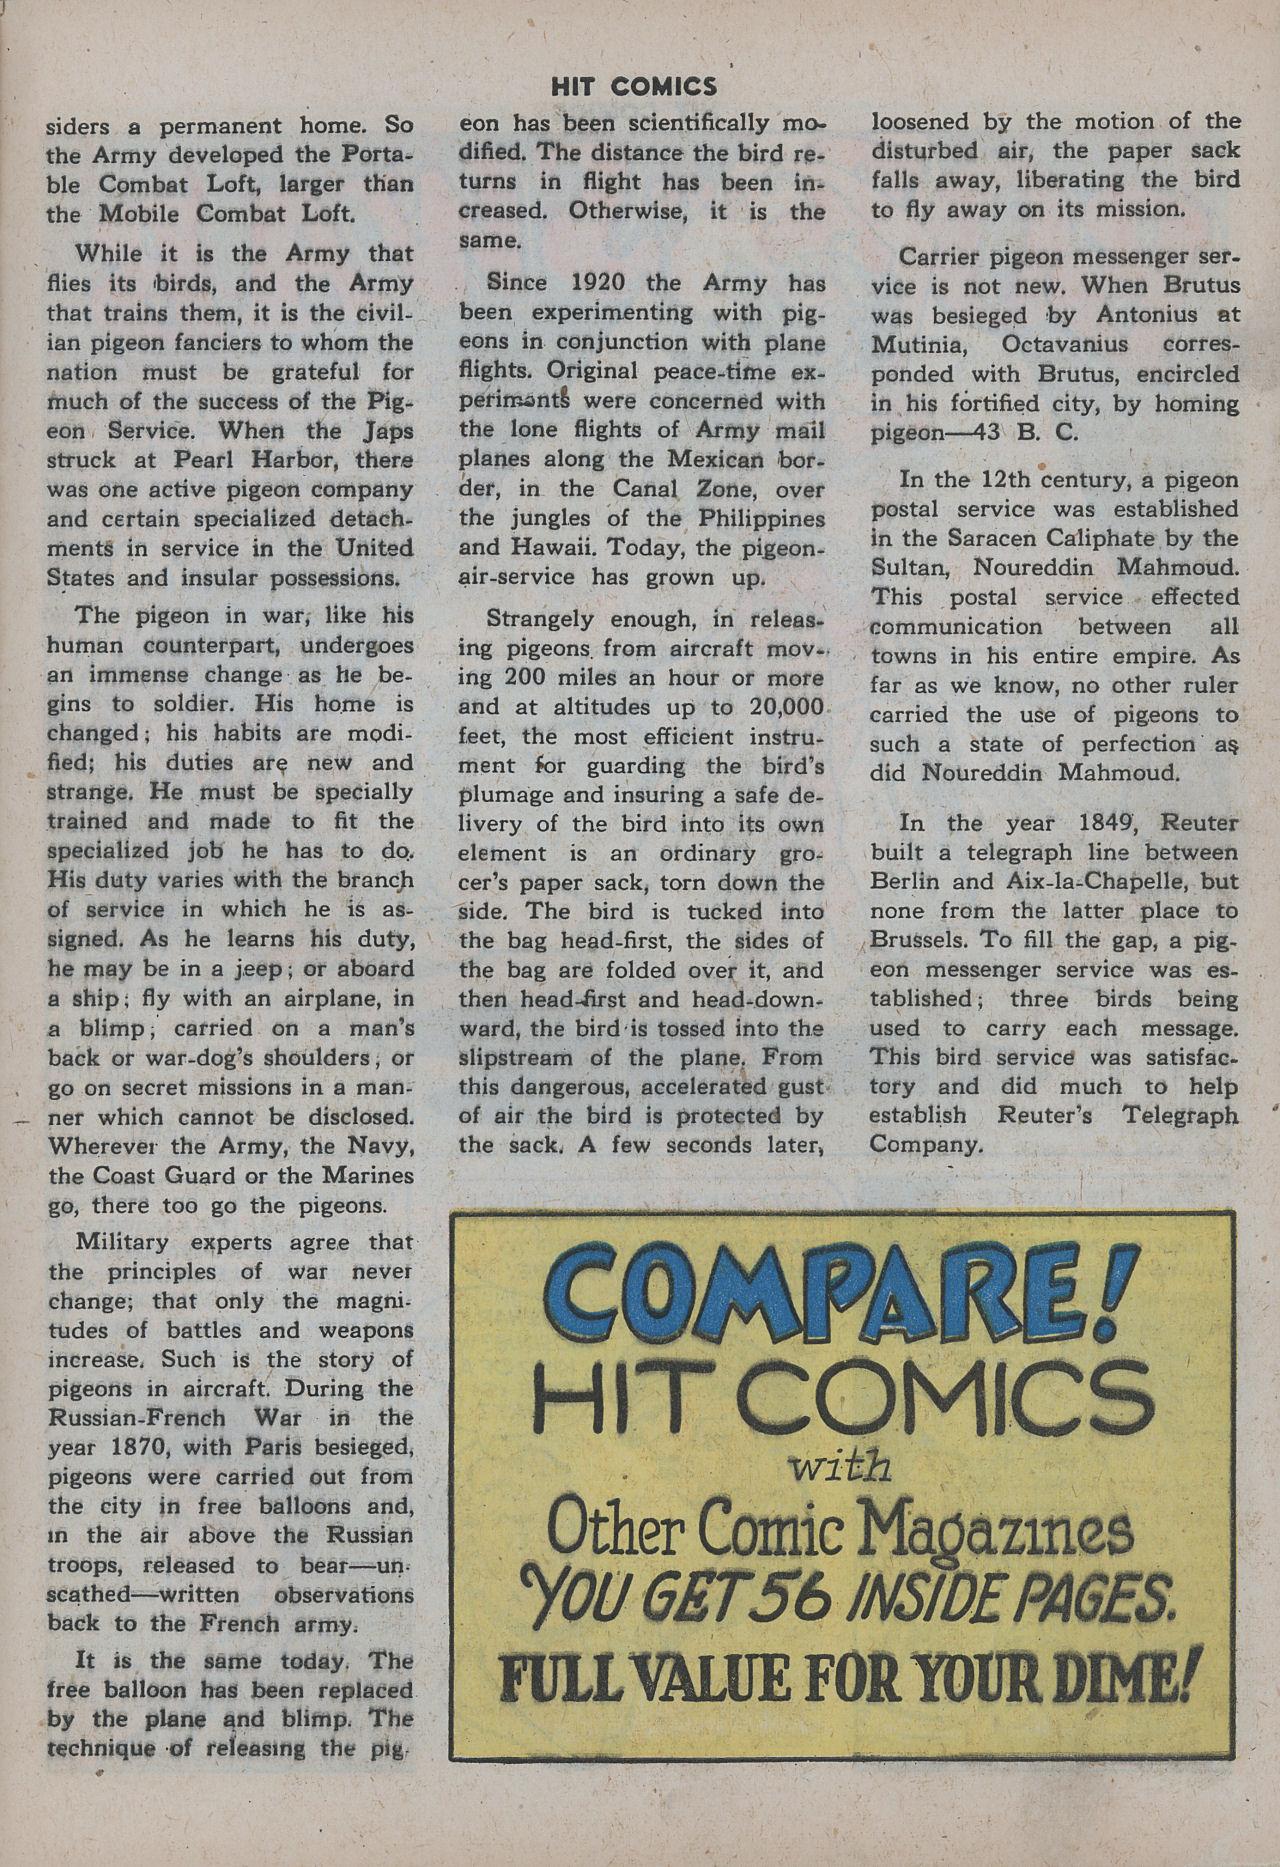 Read online Hit Comics comic -  Issue #38 - 48